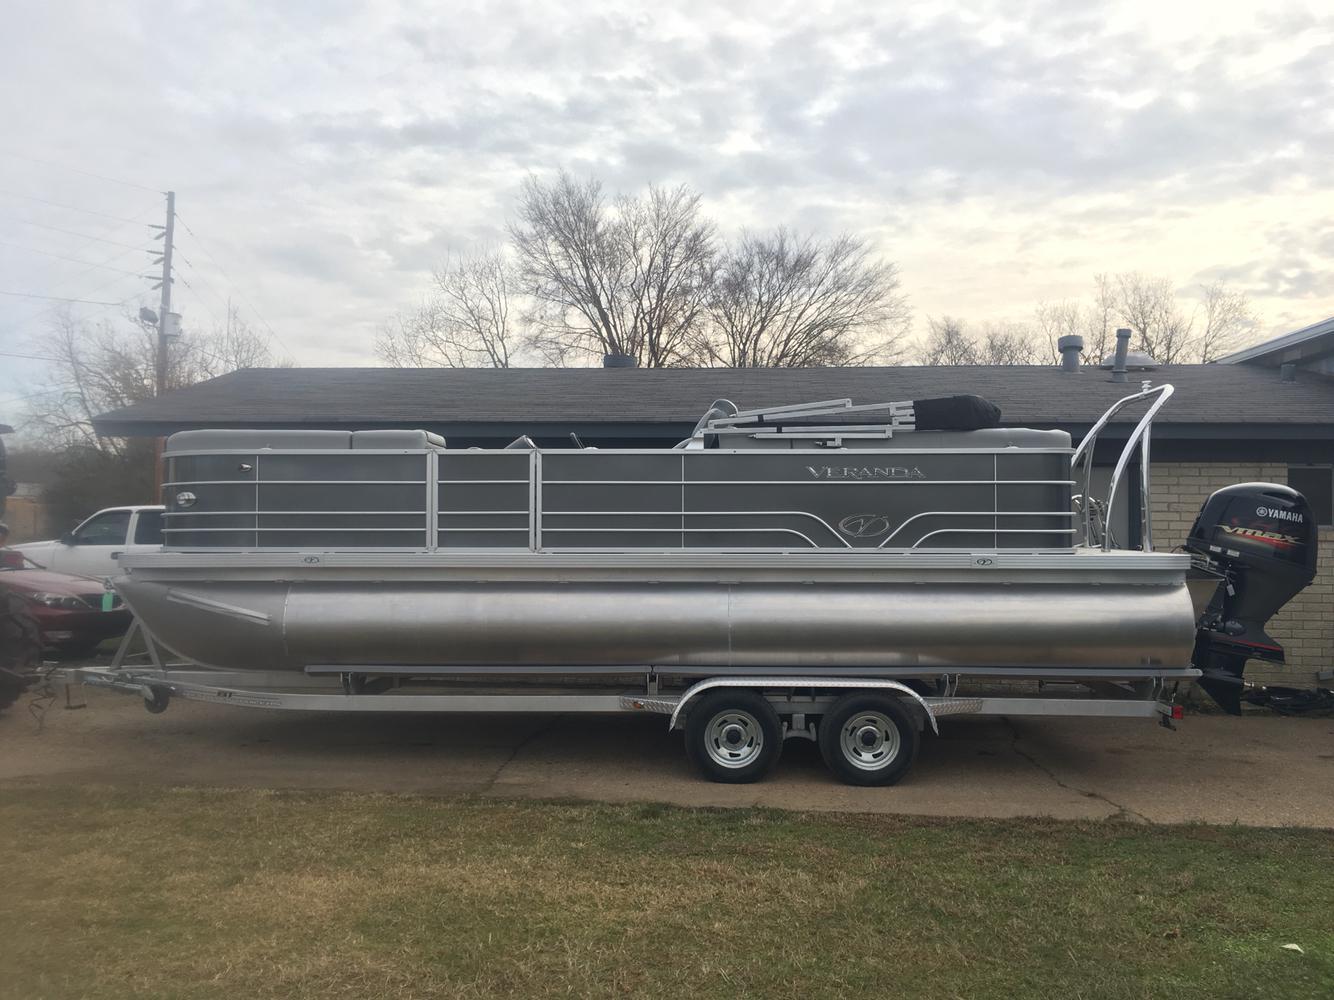 Veranda 2018  2018 Veranda 22RC for sale in Monroe, LA   B & L Marine (318) 343-1250